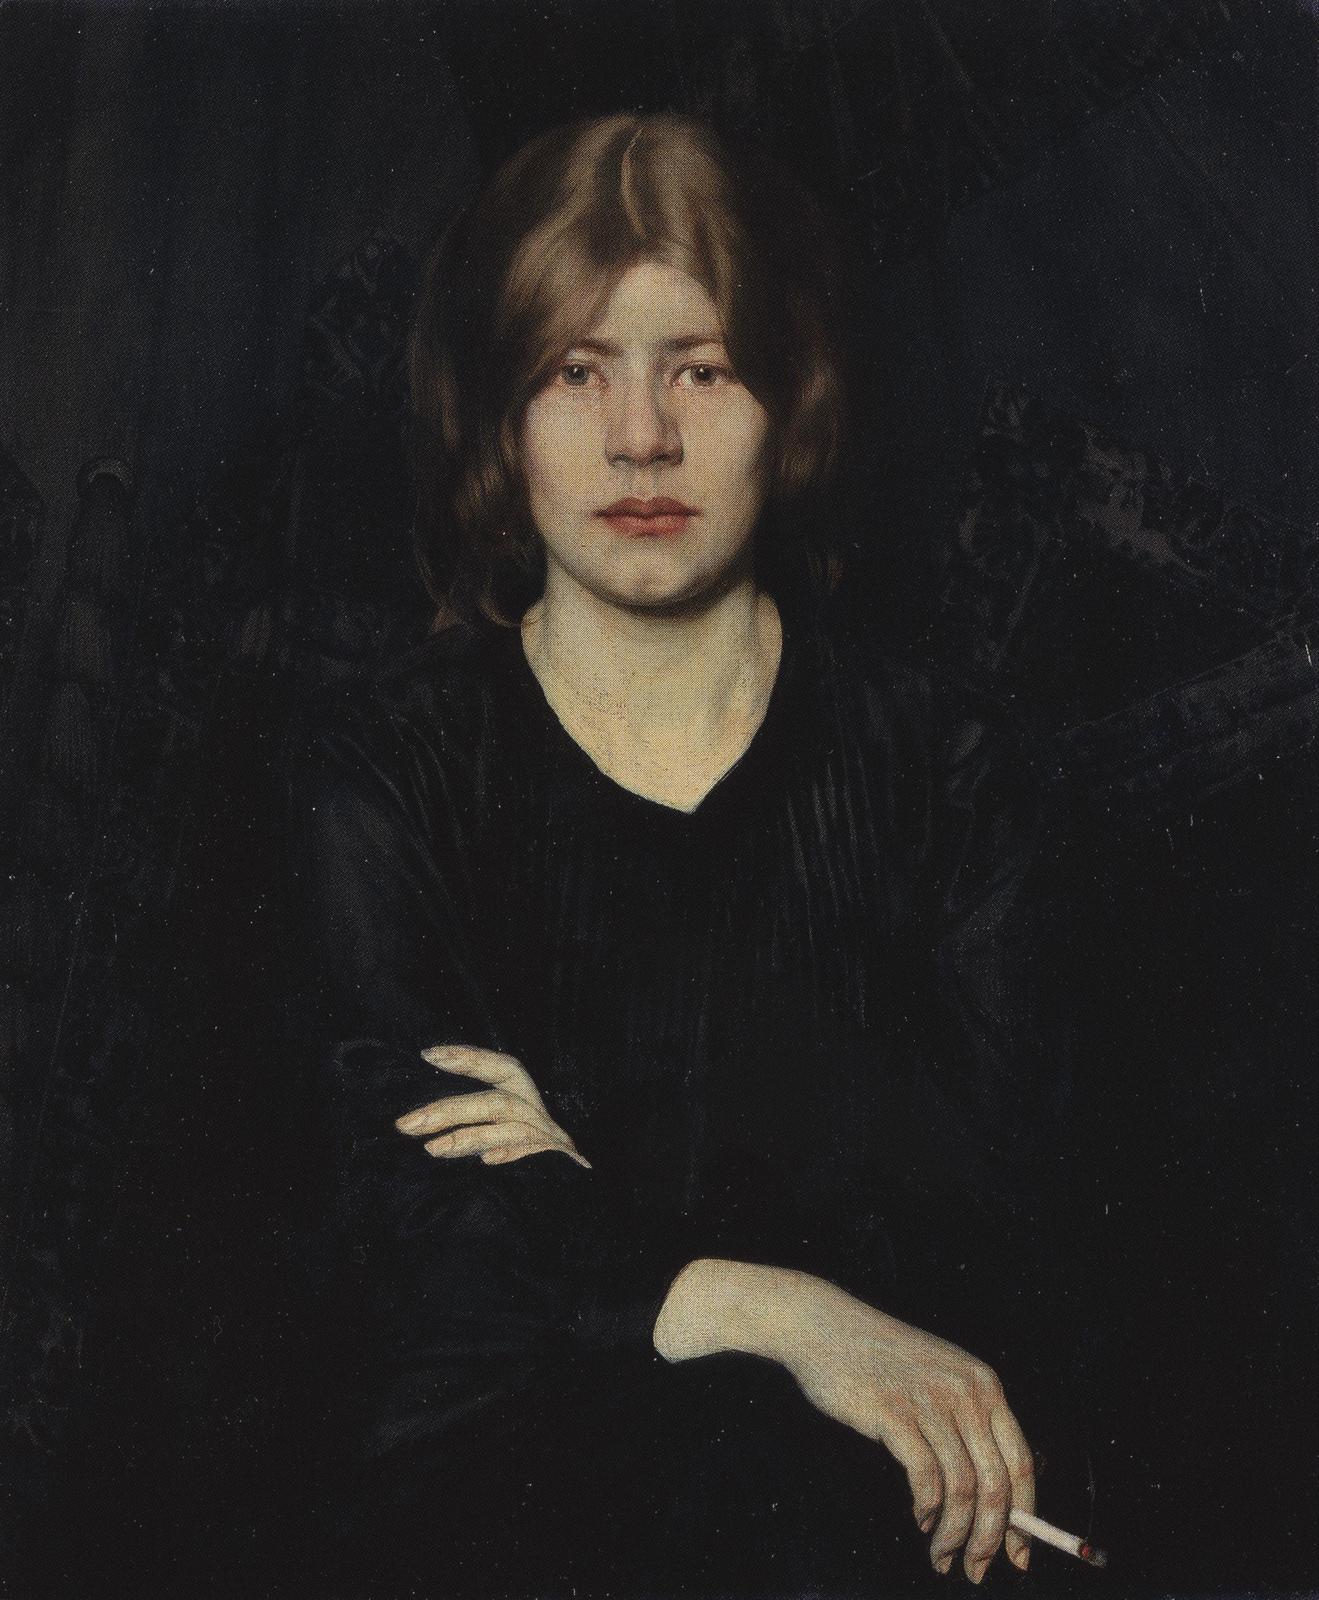 Oskar Zwintscher Lady with Cigarette Dame mit Zigarette, 1904